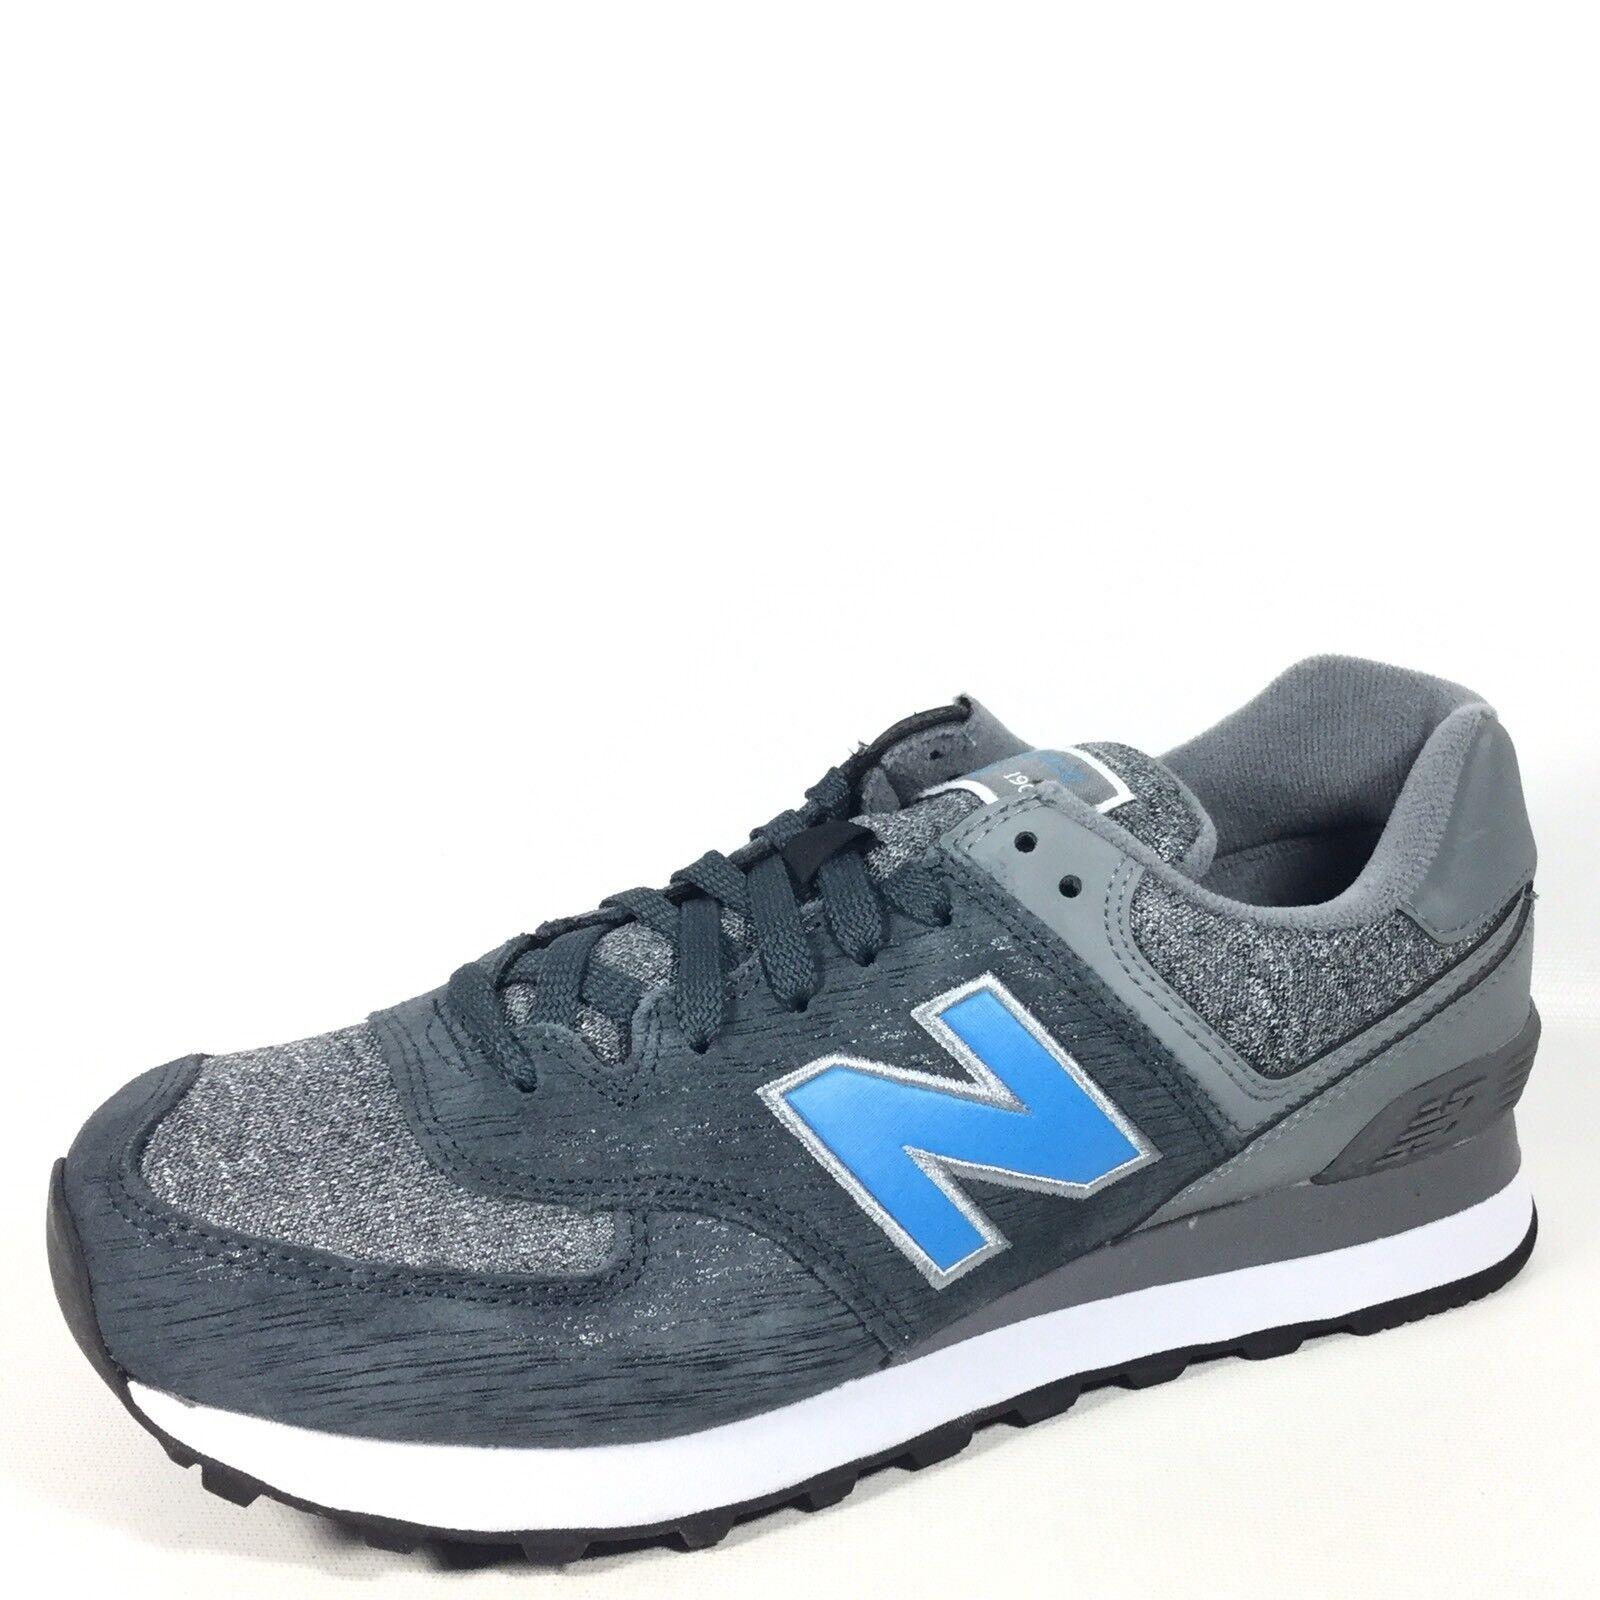 New Balance ML574TTC Mens Size 7.5 D Grey Classic Sneakers.